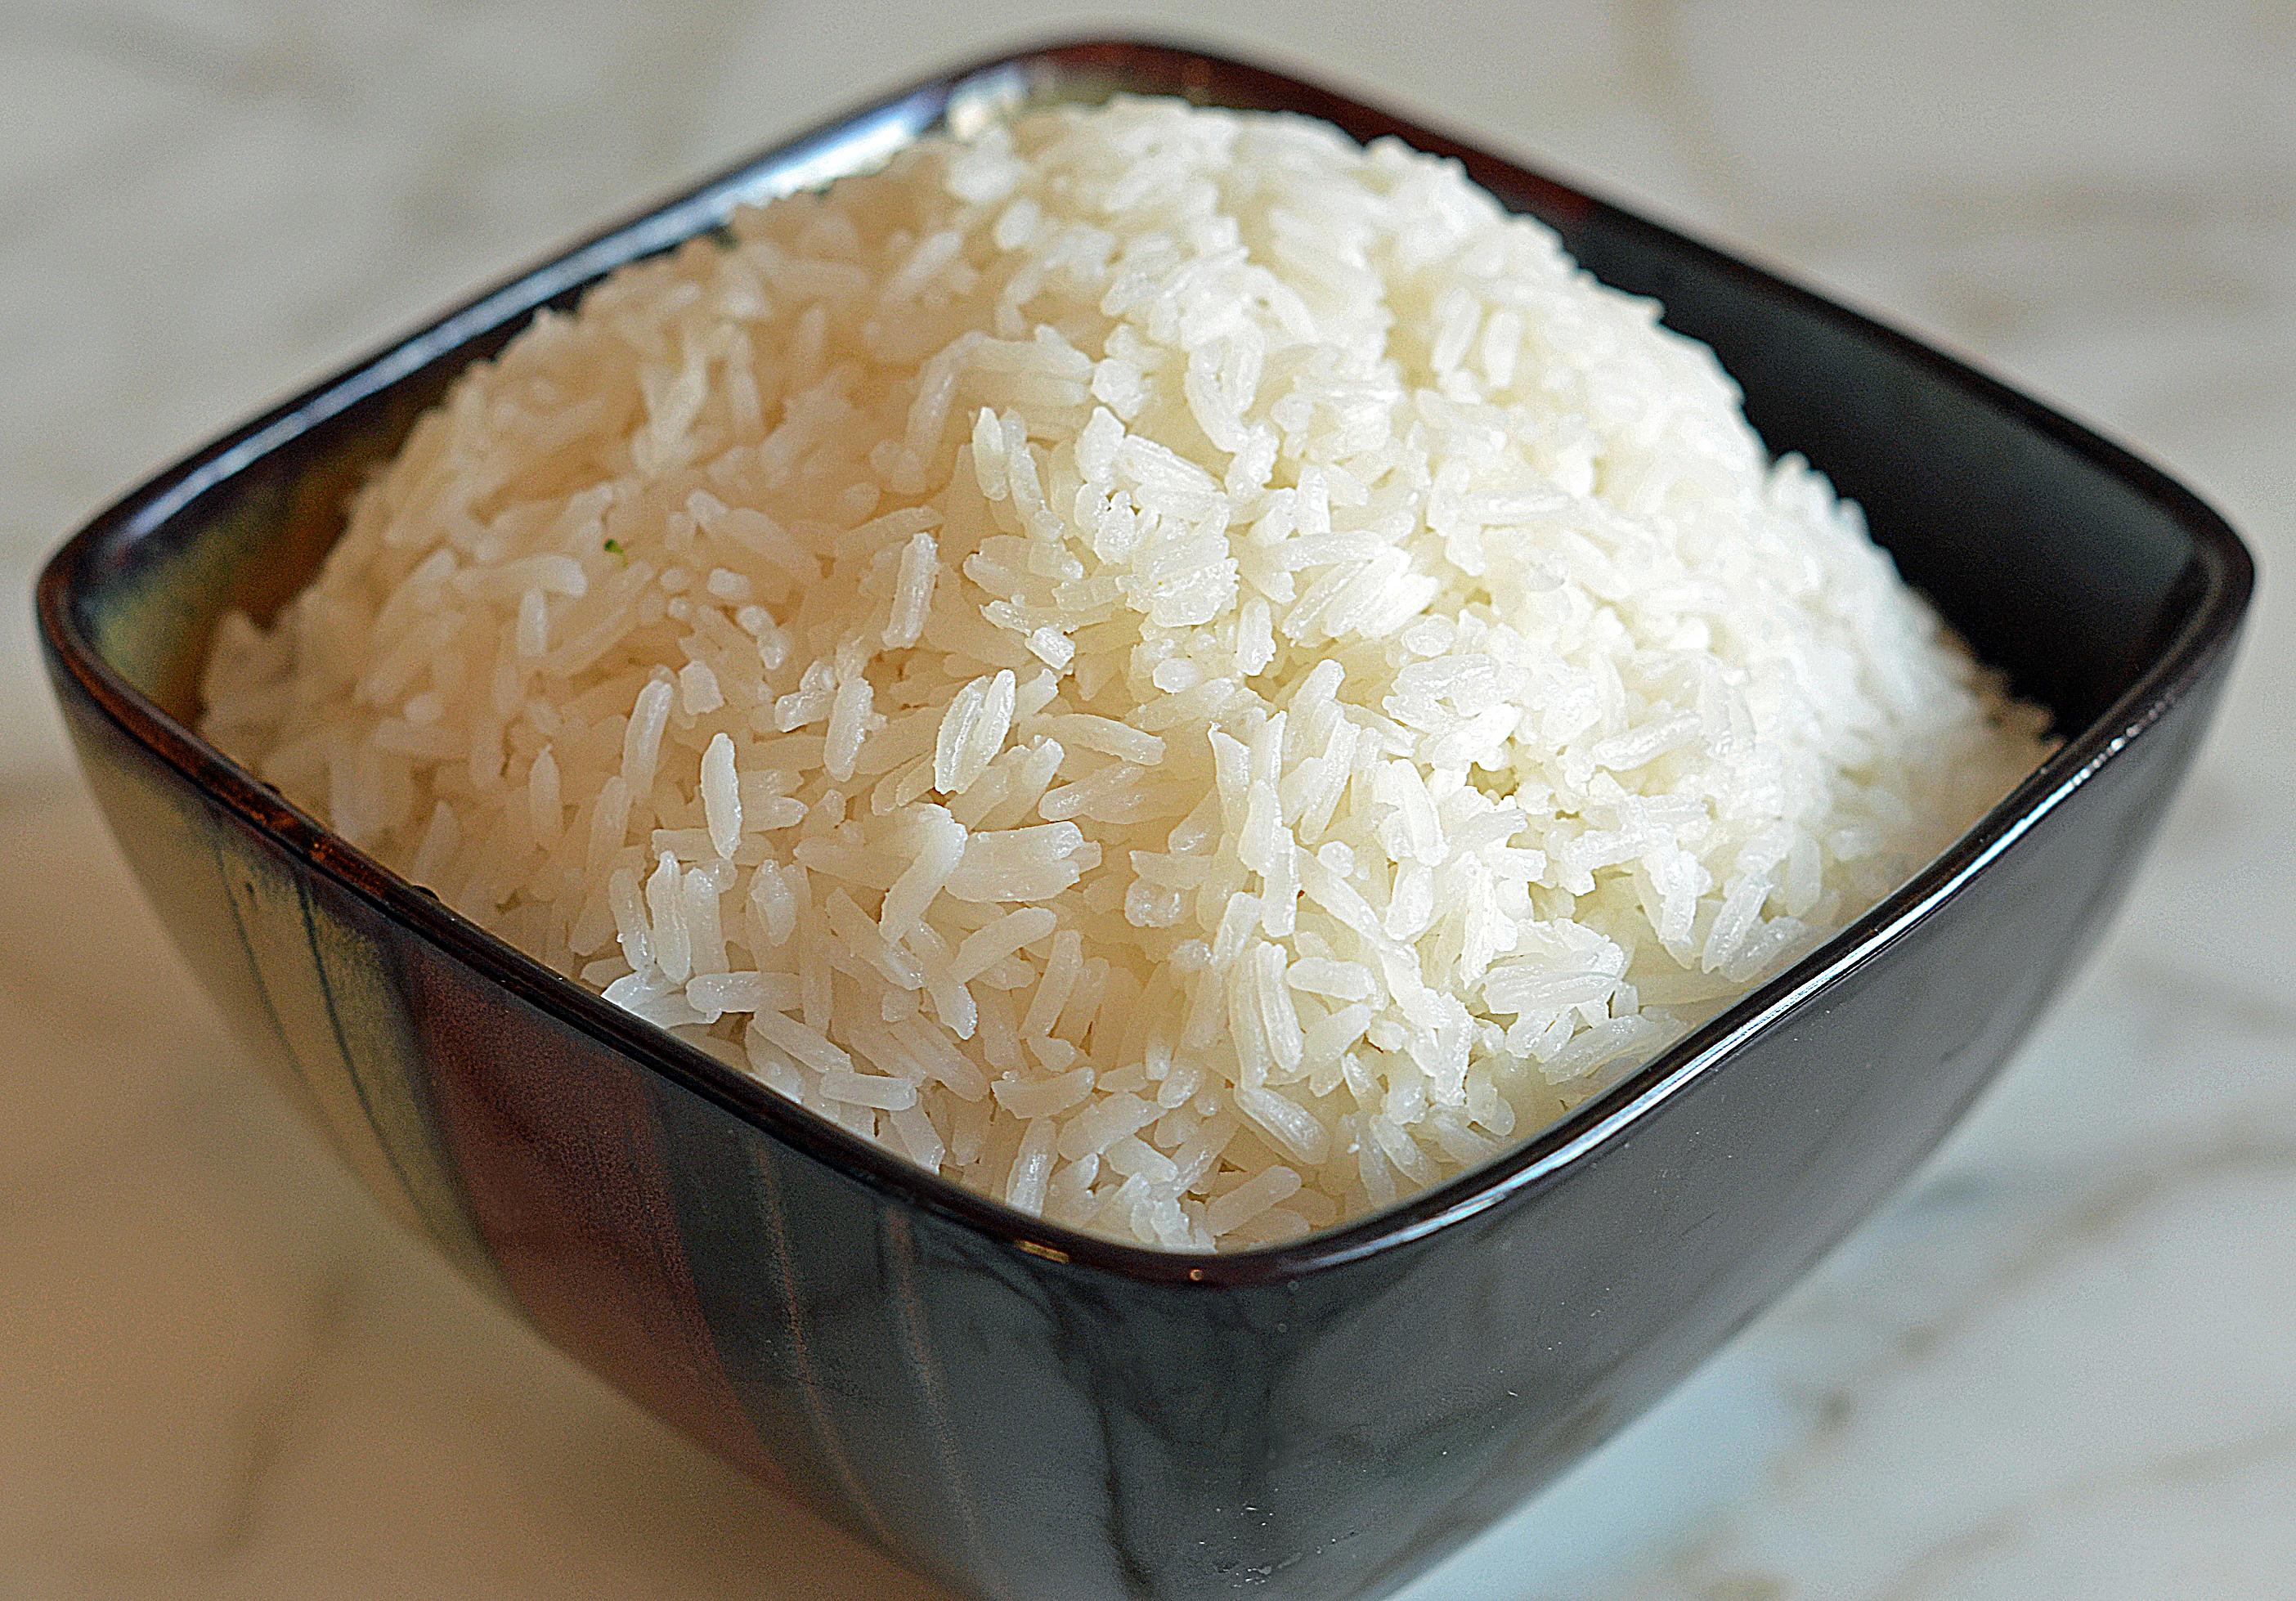 IR 64 Paramal Silky Sortex Rice (Broken 5 %)